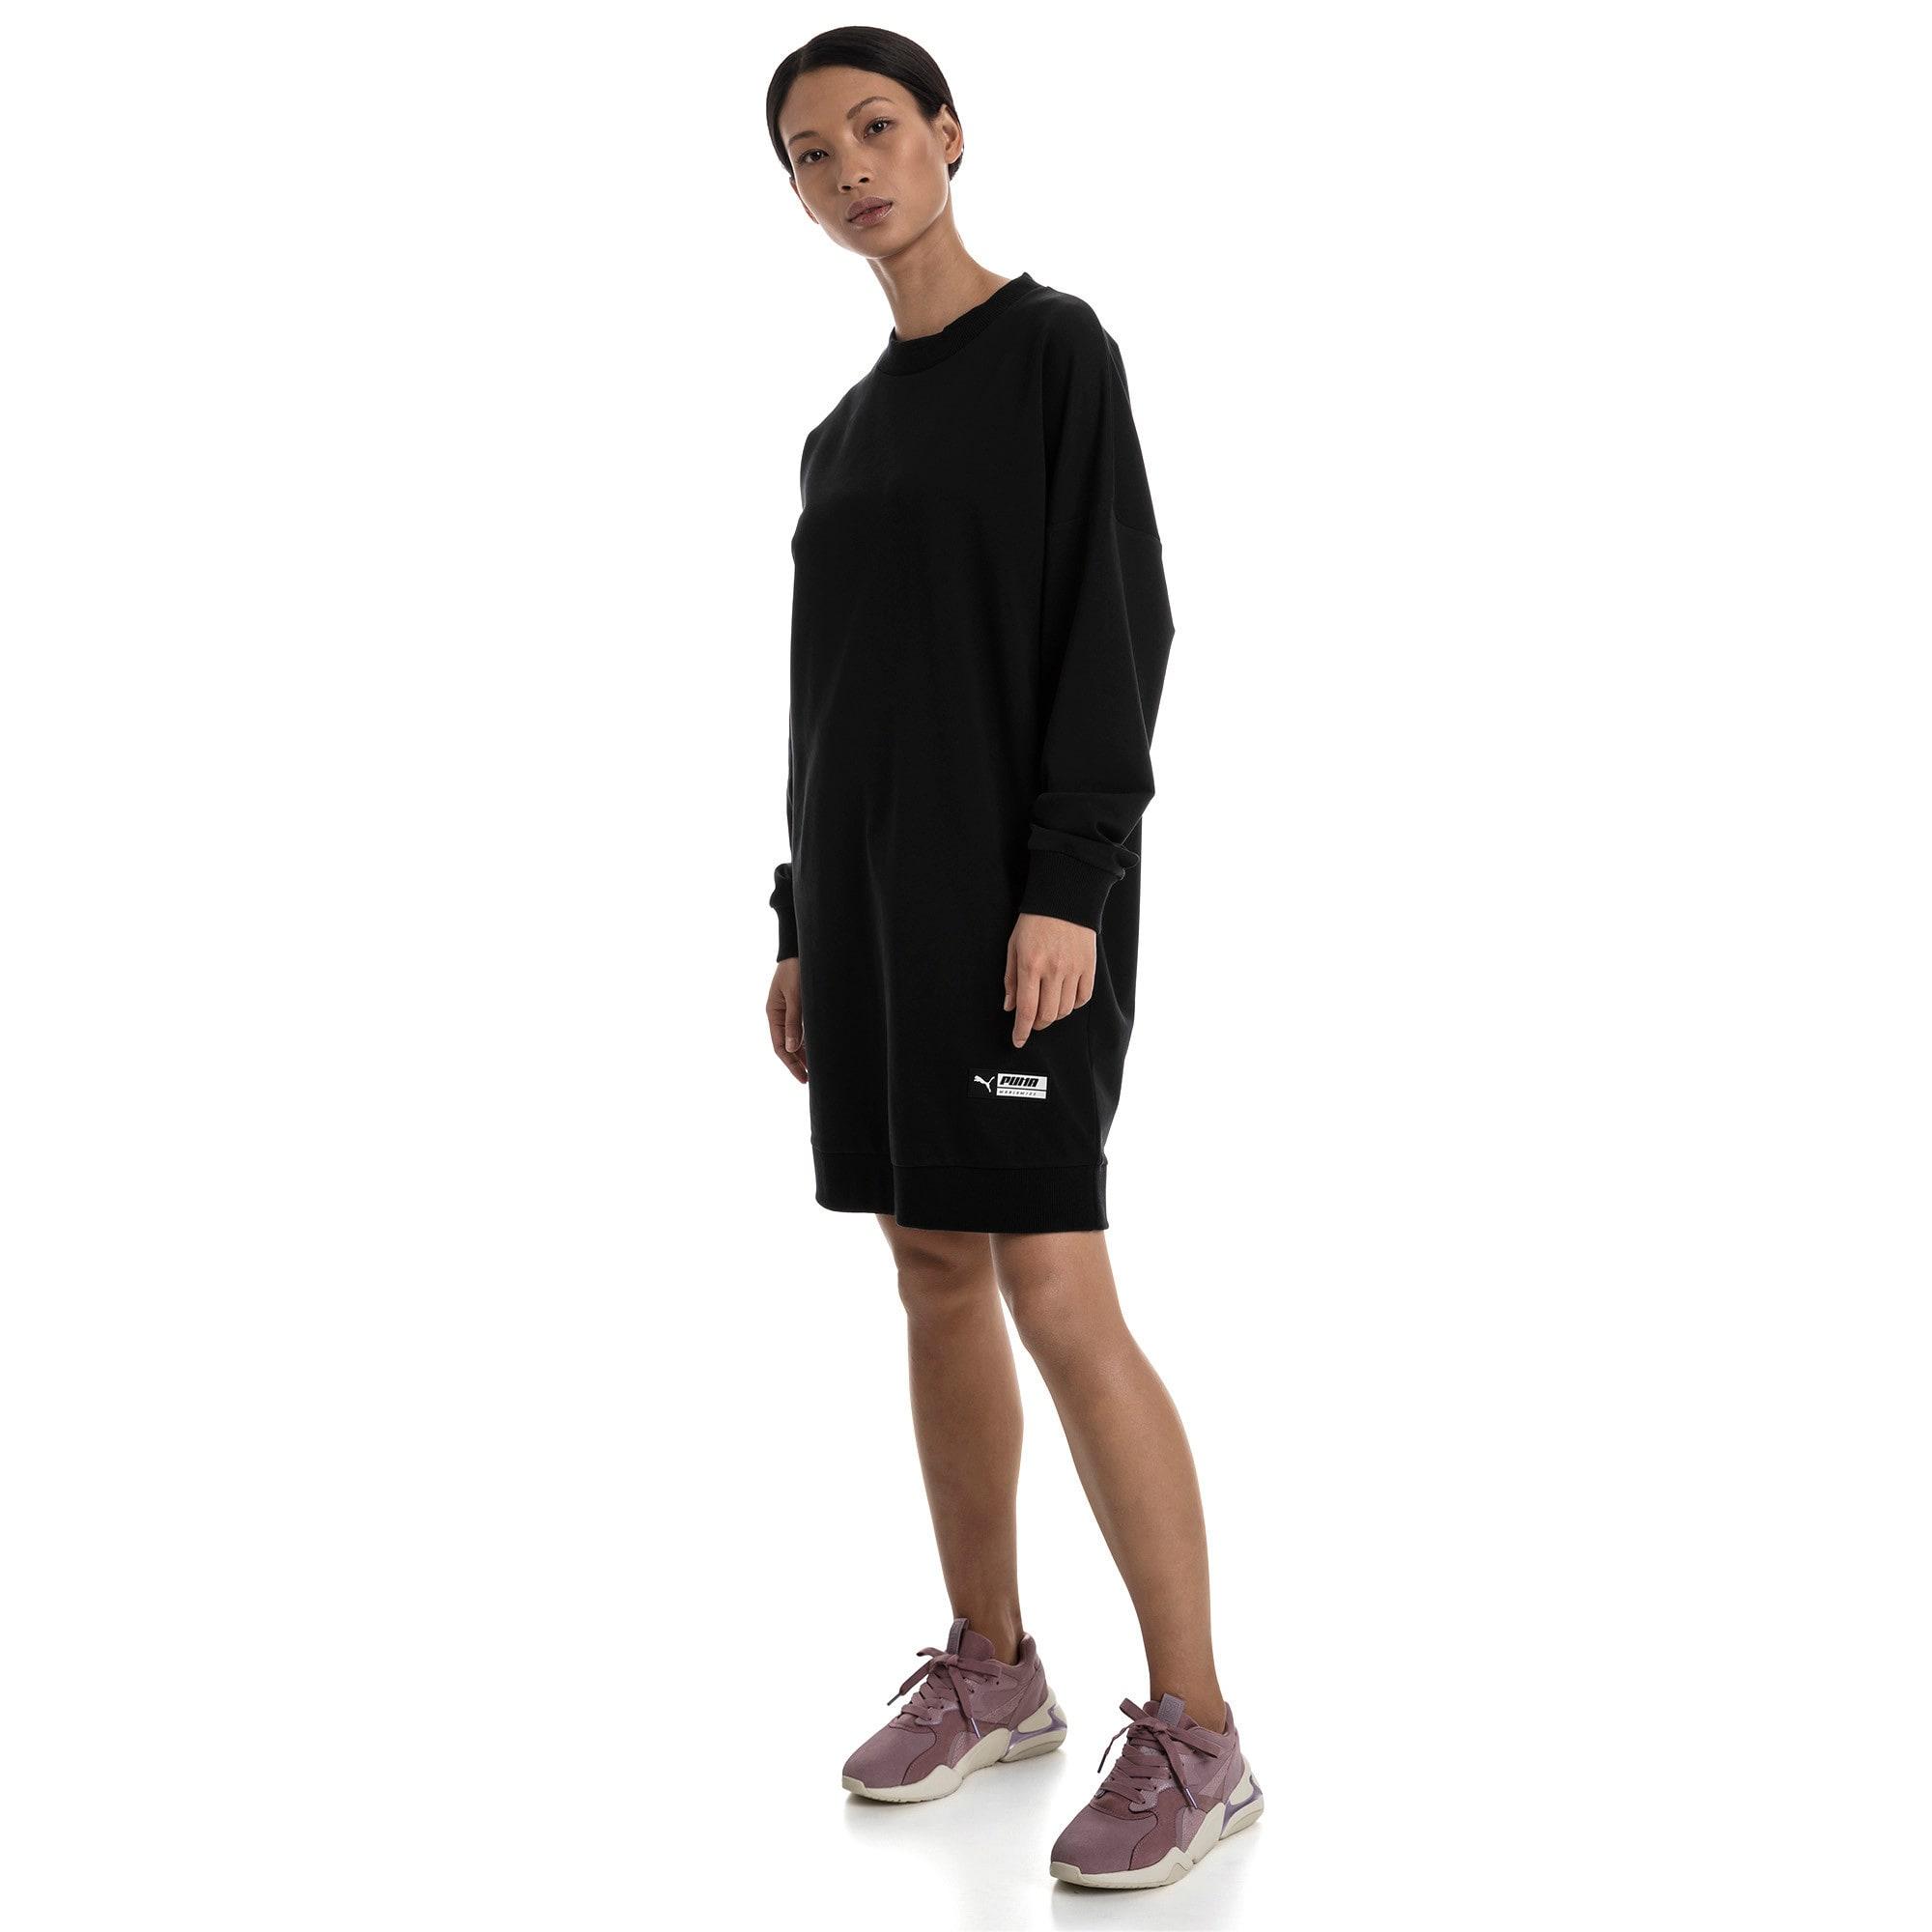 Thumbnail 3 of Trailblazer Women's Long Crewneck Sweatshirt, Cotton Black, medium